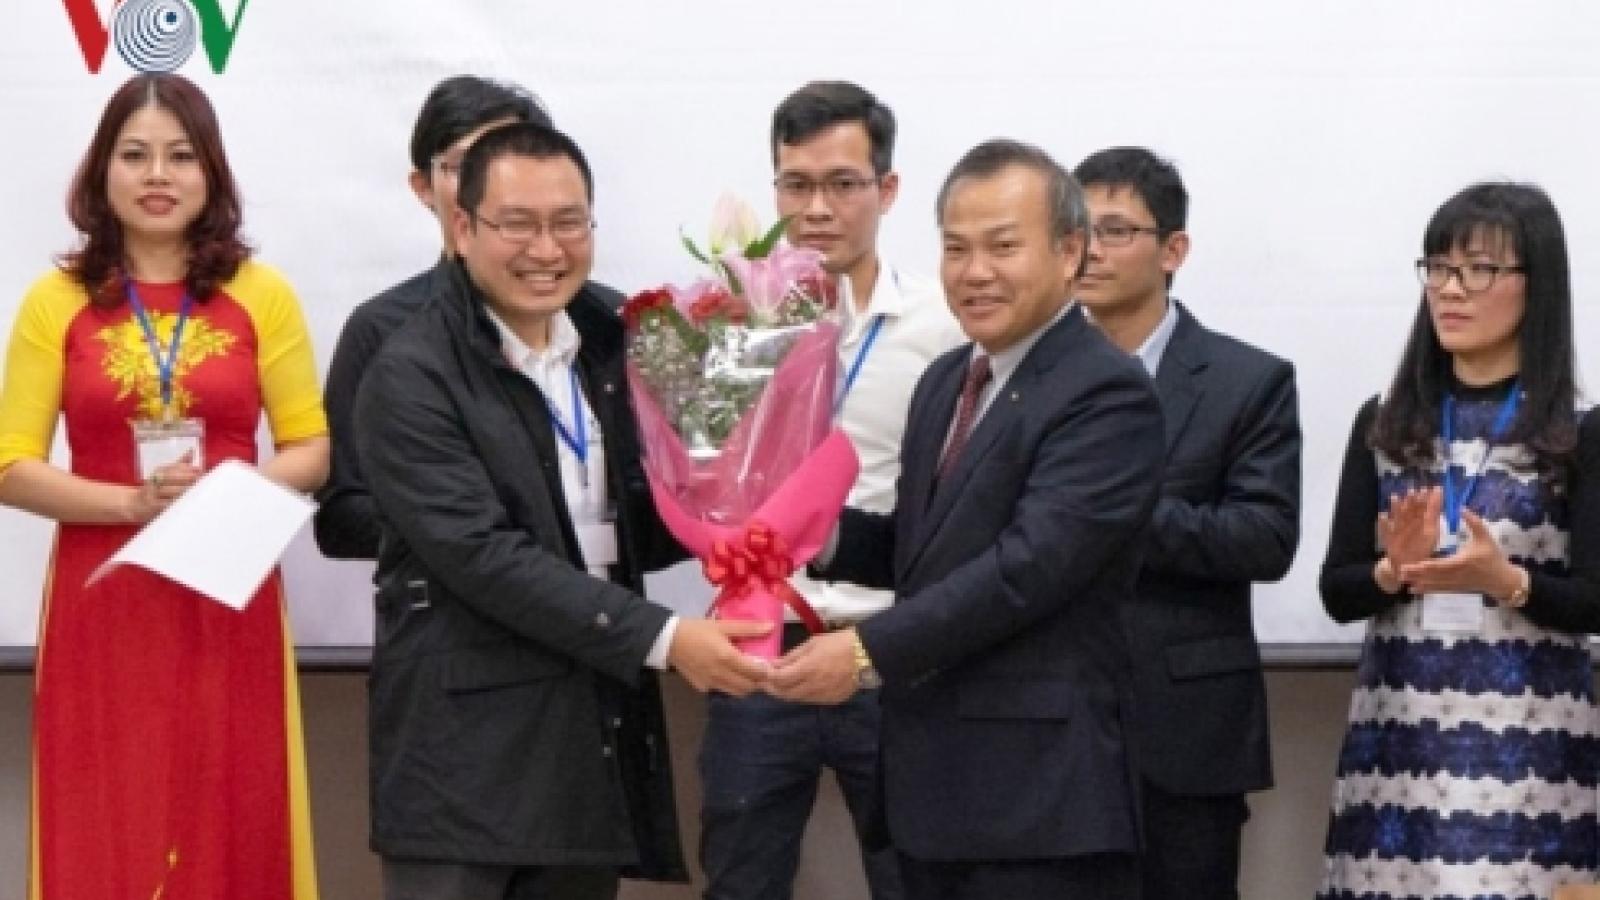 Japan's Aichi prefecture sees creation of Overseas Vietnamese Association